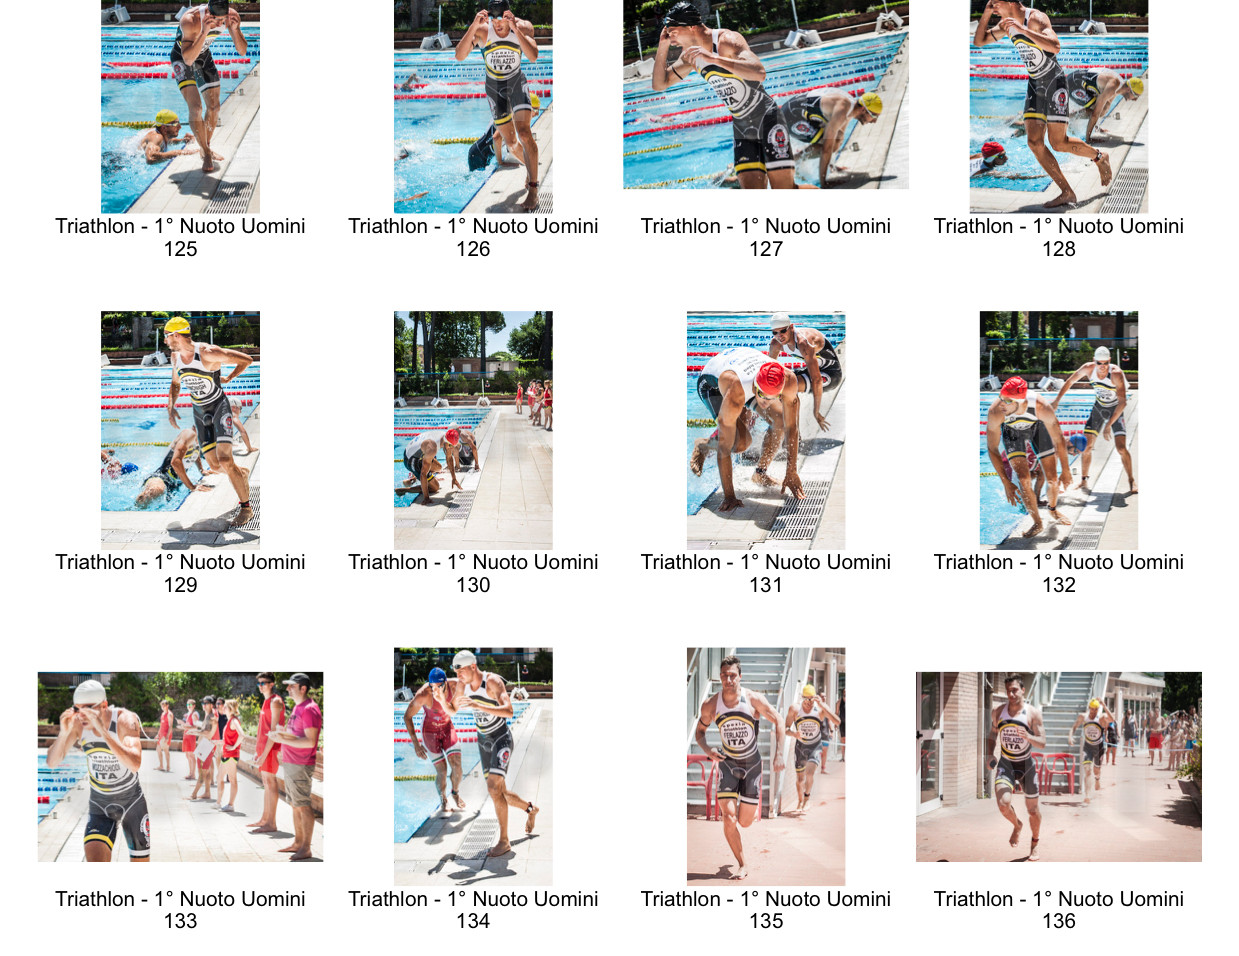 Triathlon_V.Elsa_-_1°_Frazione_Nuoto_Uomini_-07.jpg